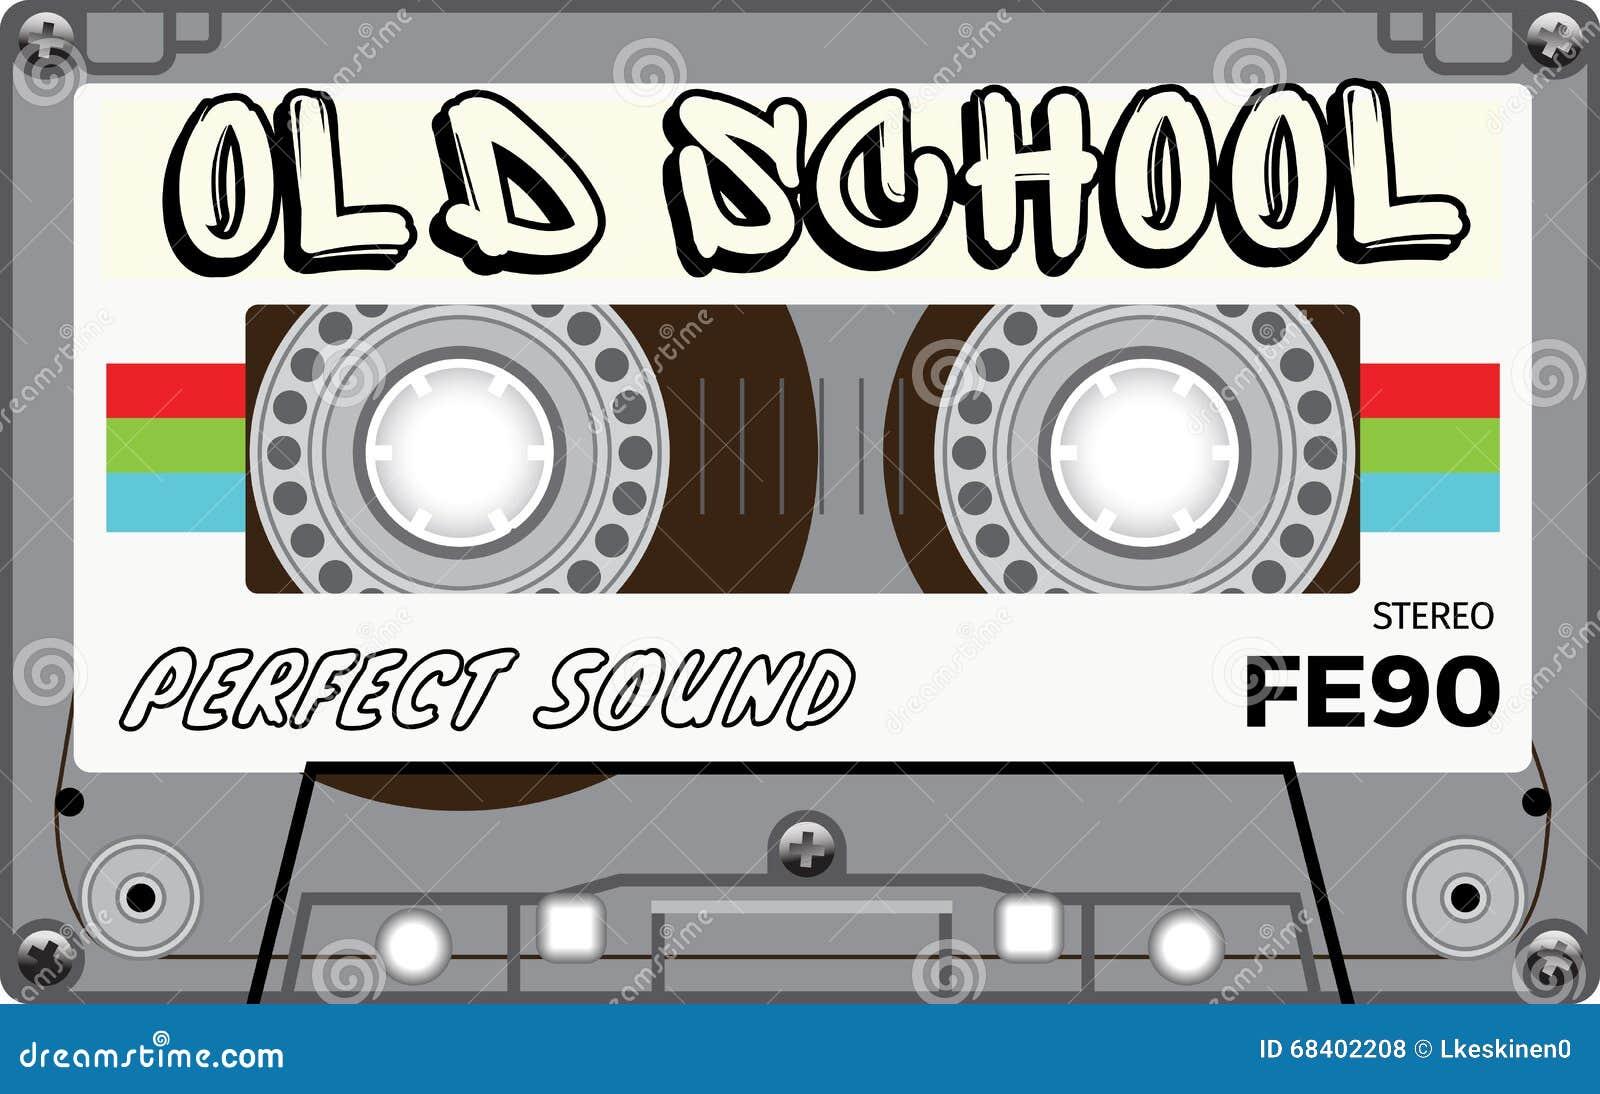 vintage old school cassette with name on it stock photo. Black Bedroom Furniture Sets. Home Design Ideas